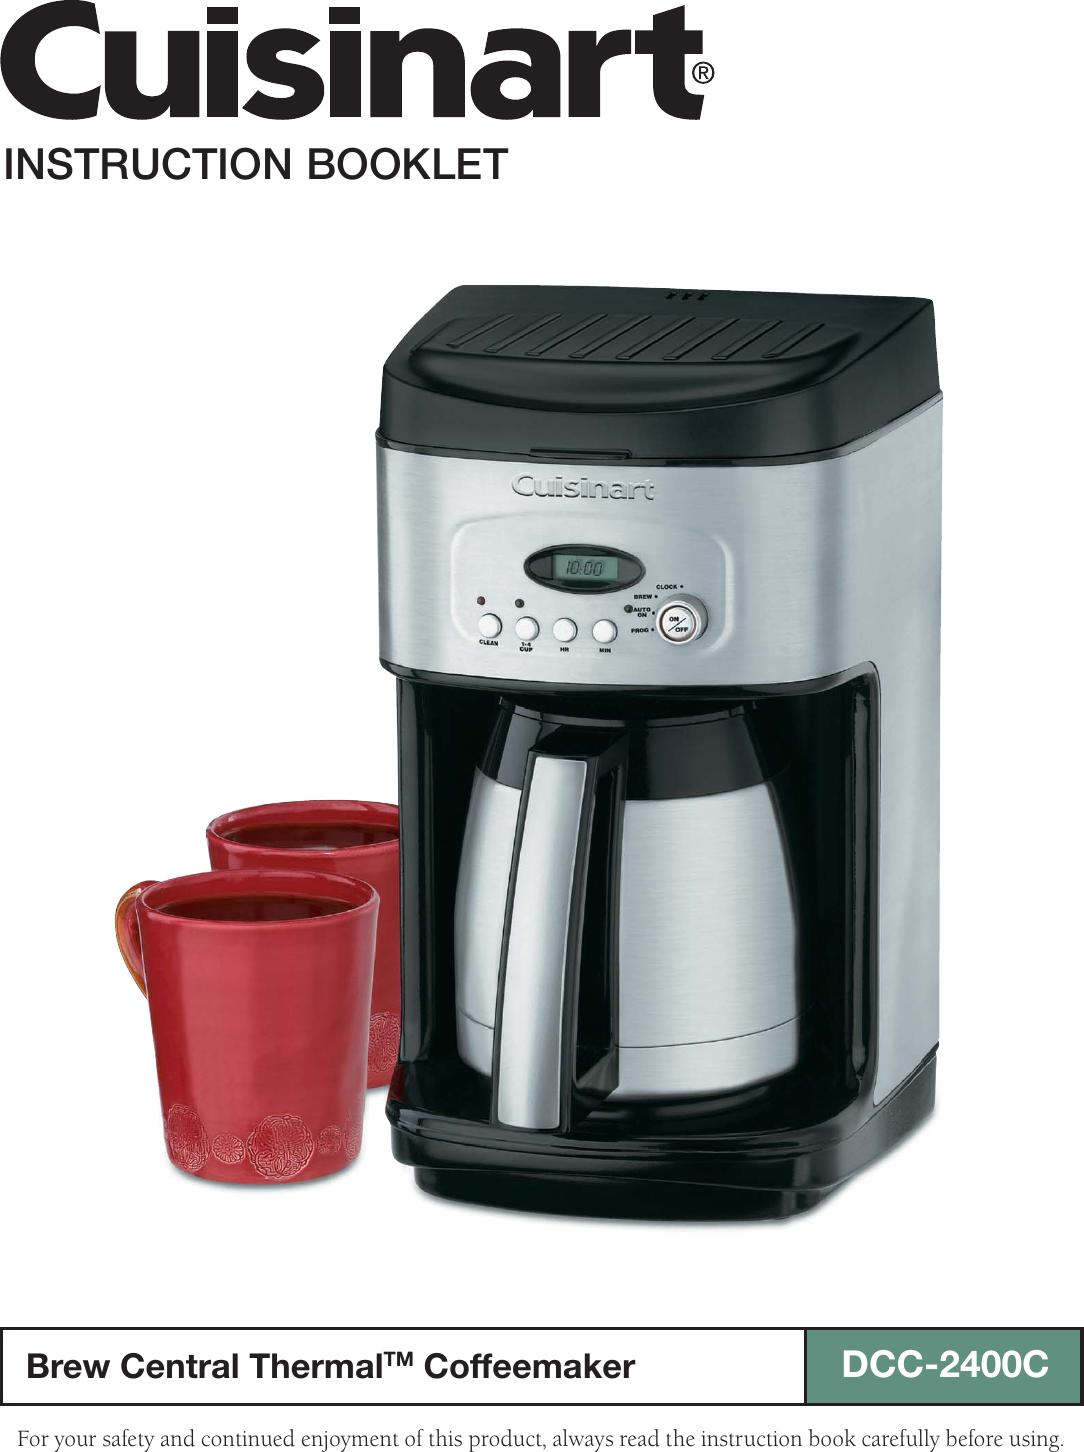 Cuisinart Coffeemaker Dcc 2400c Users Manual 2400c Ib